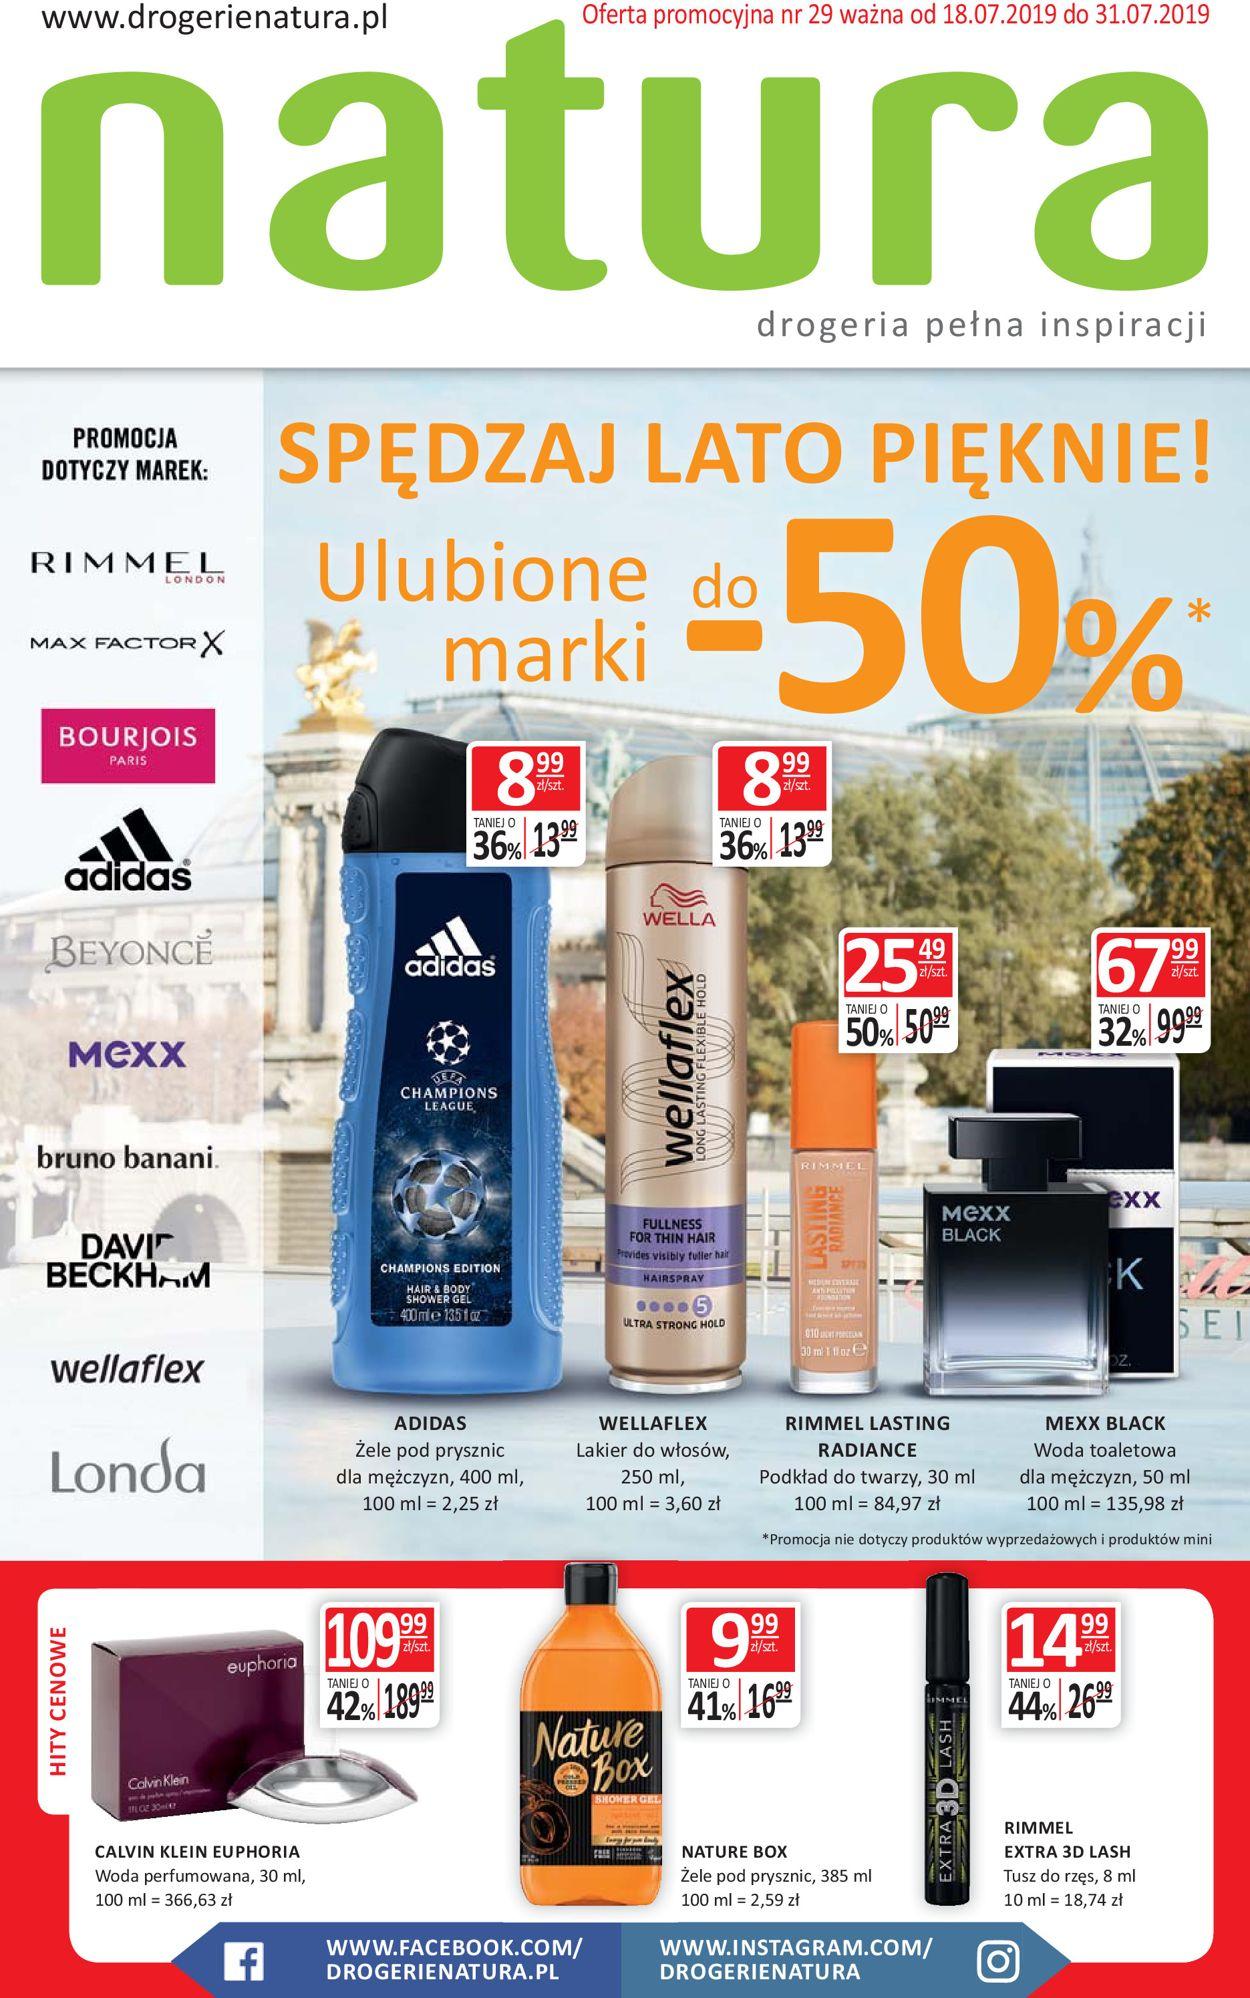 Gazetka promocyjna Natura - 18.07-31.07.2019